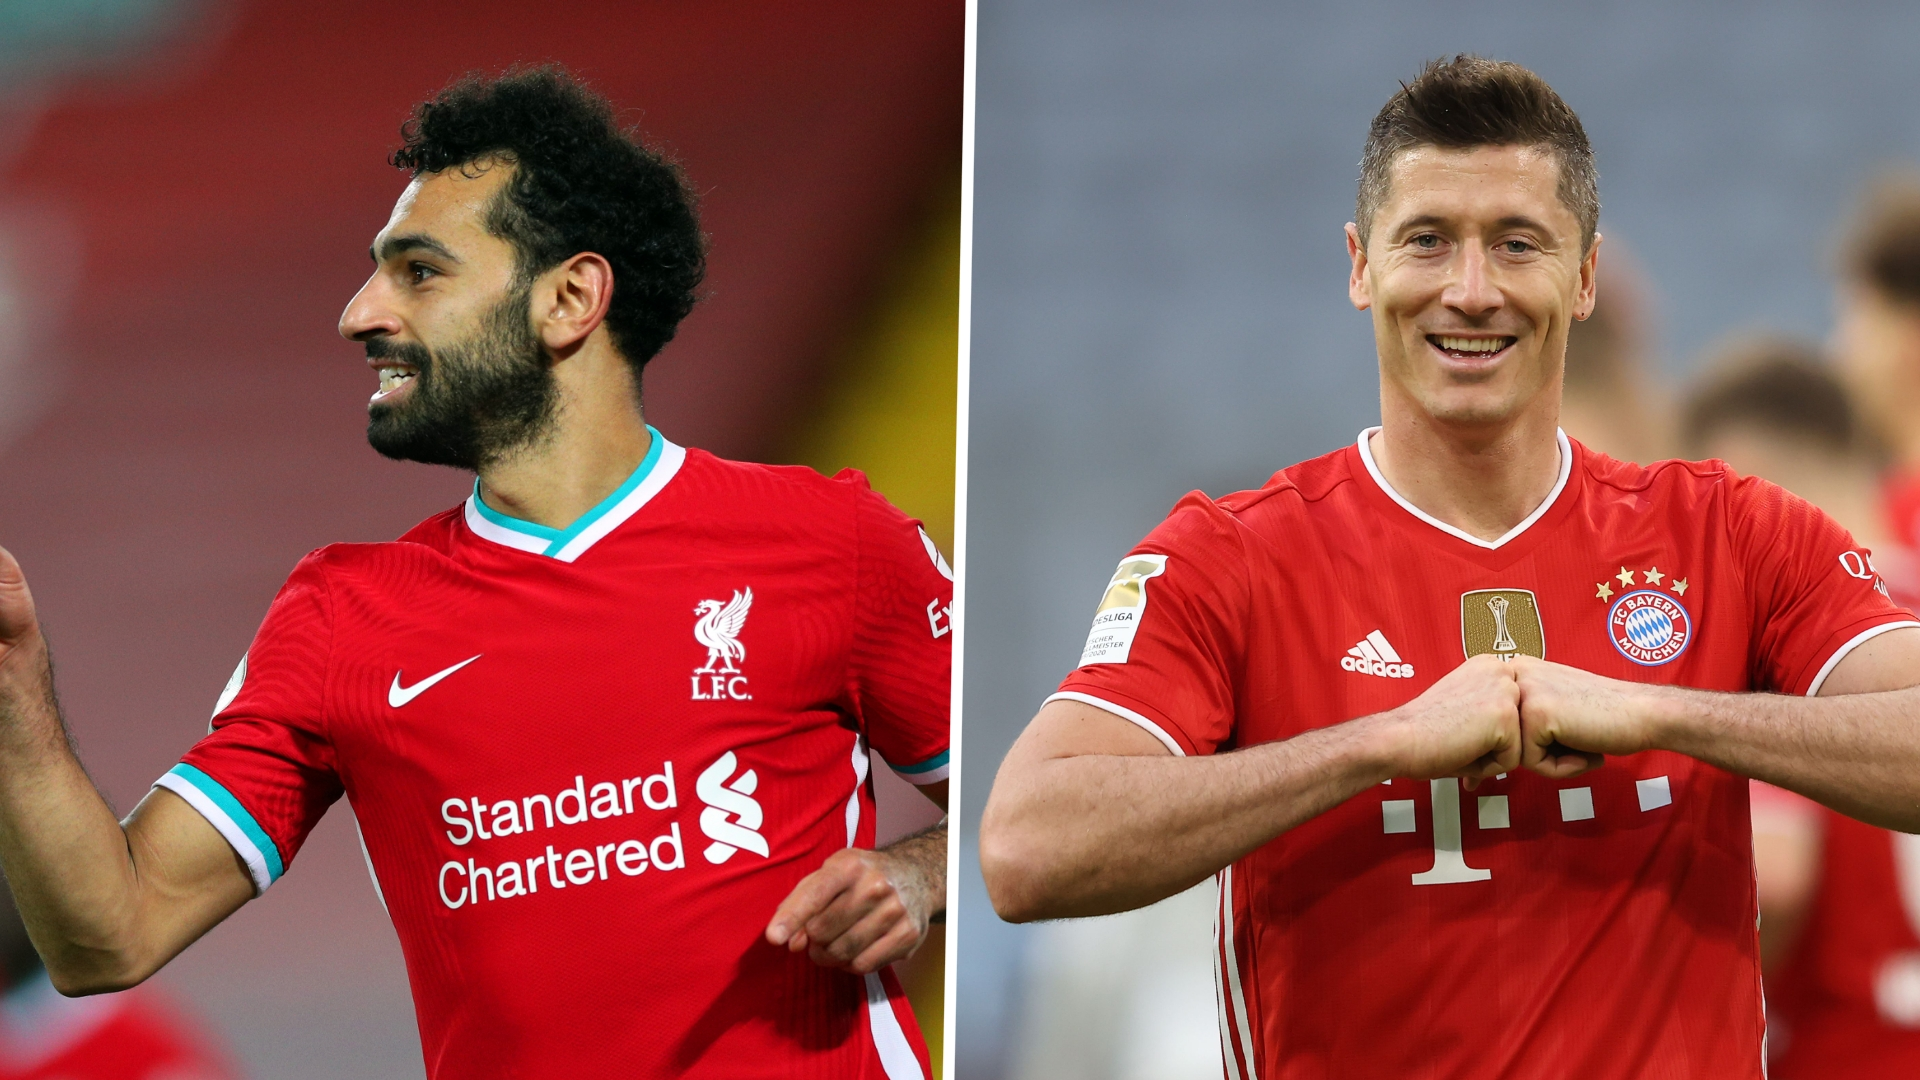 Klopp says Salah 'under-appreciated' as Liverpool boss compares Egyptian to Lewandowski